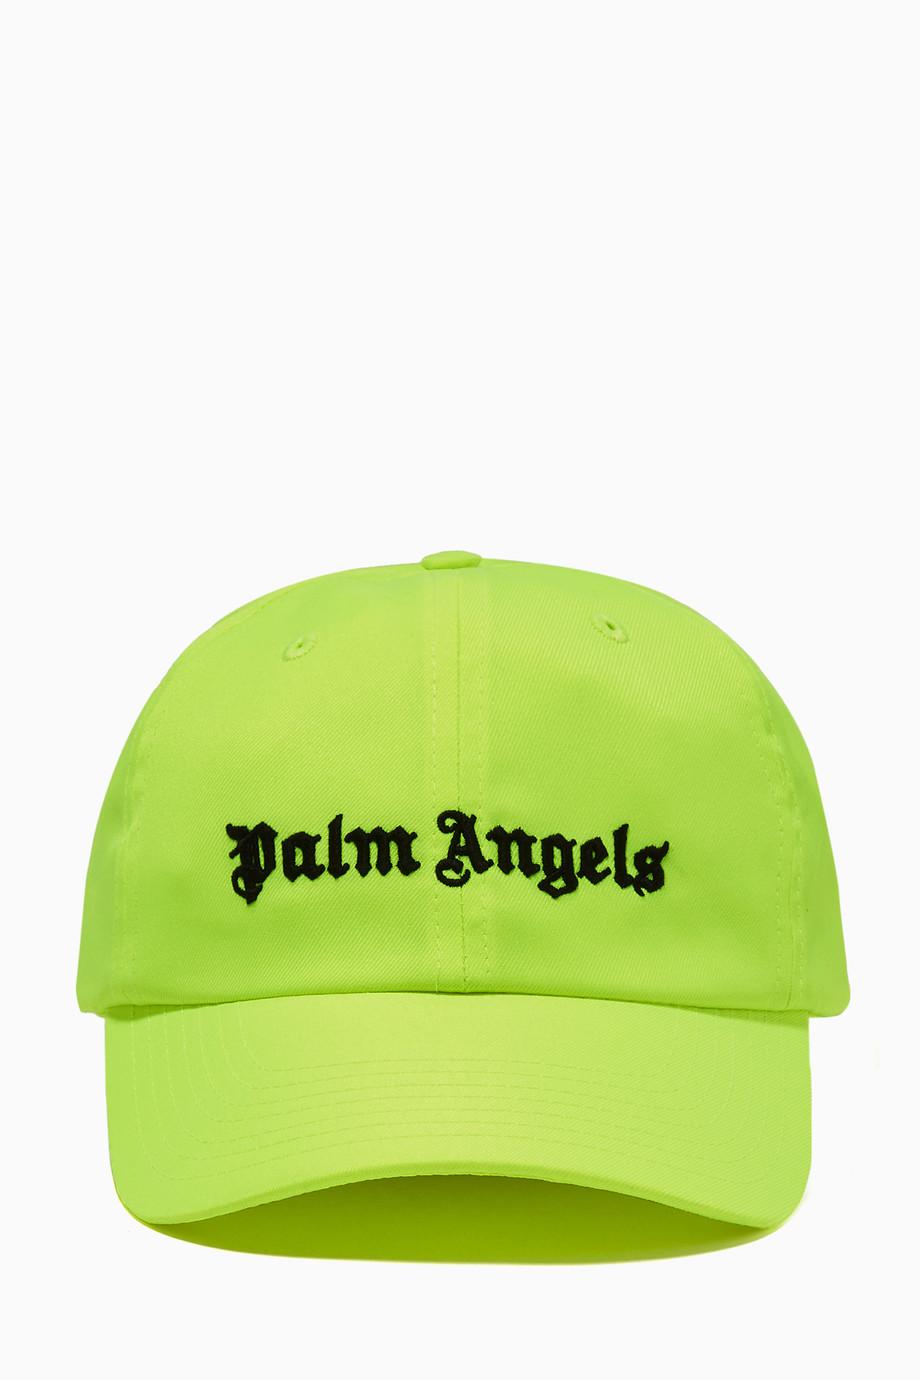 04a6782f4e9ba Shop Palm Angels Yellow Yellow Embroidered Logo Baseball Cap for Men ...